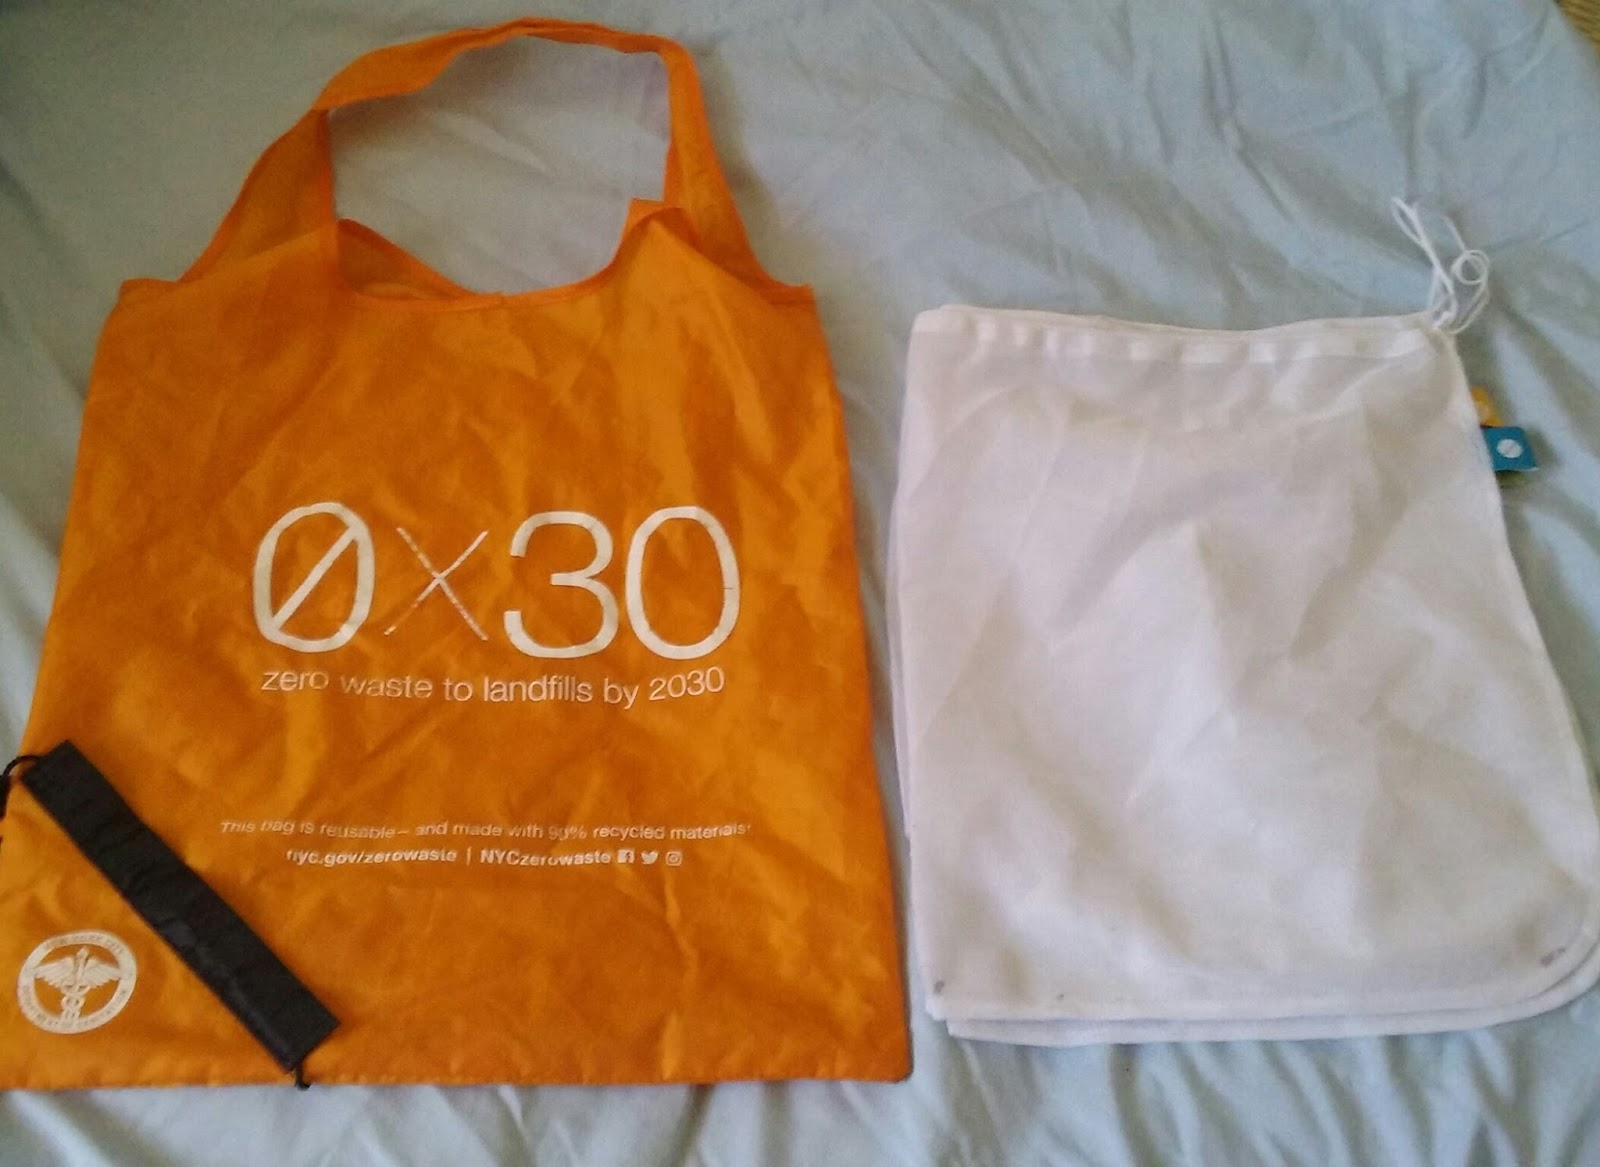 2 steps to zero waste